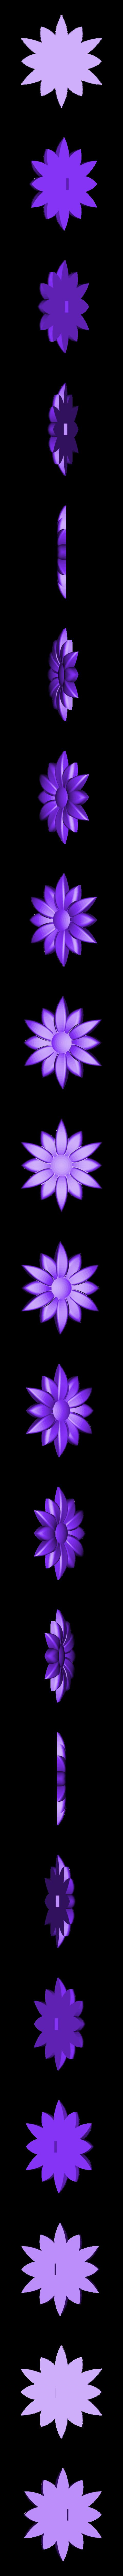 flower-support.STL Download free STL file MODULAR RING • 3D printable design, H33ro